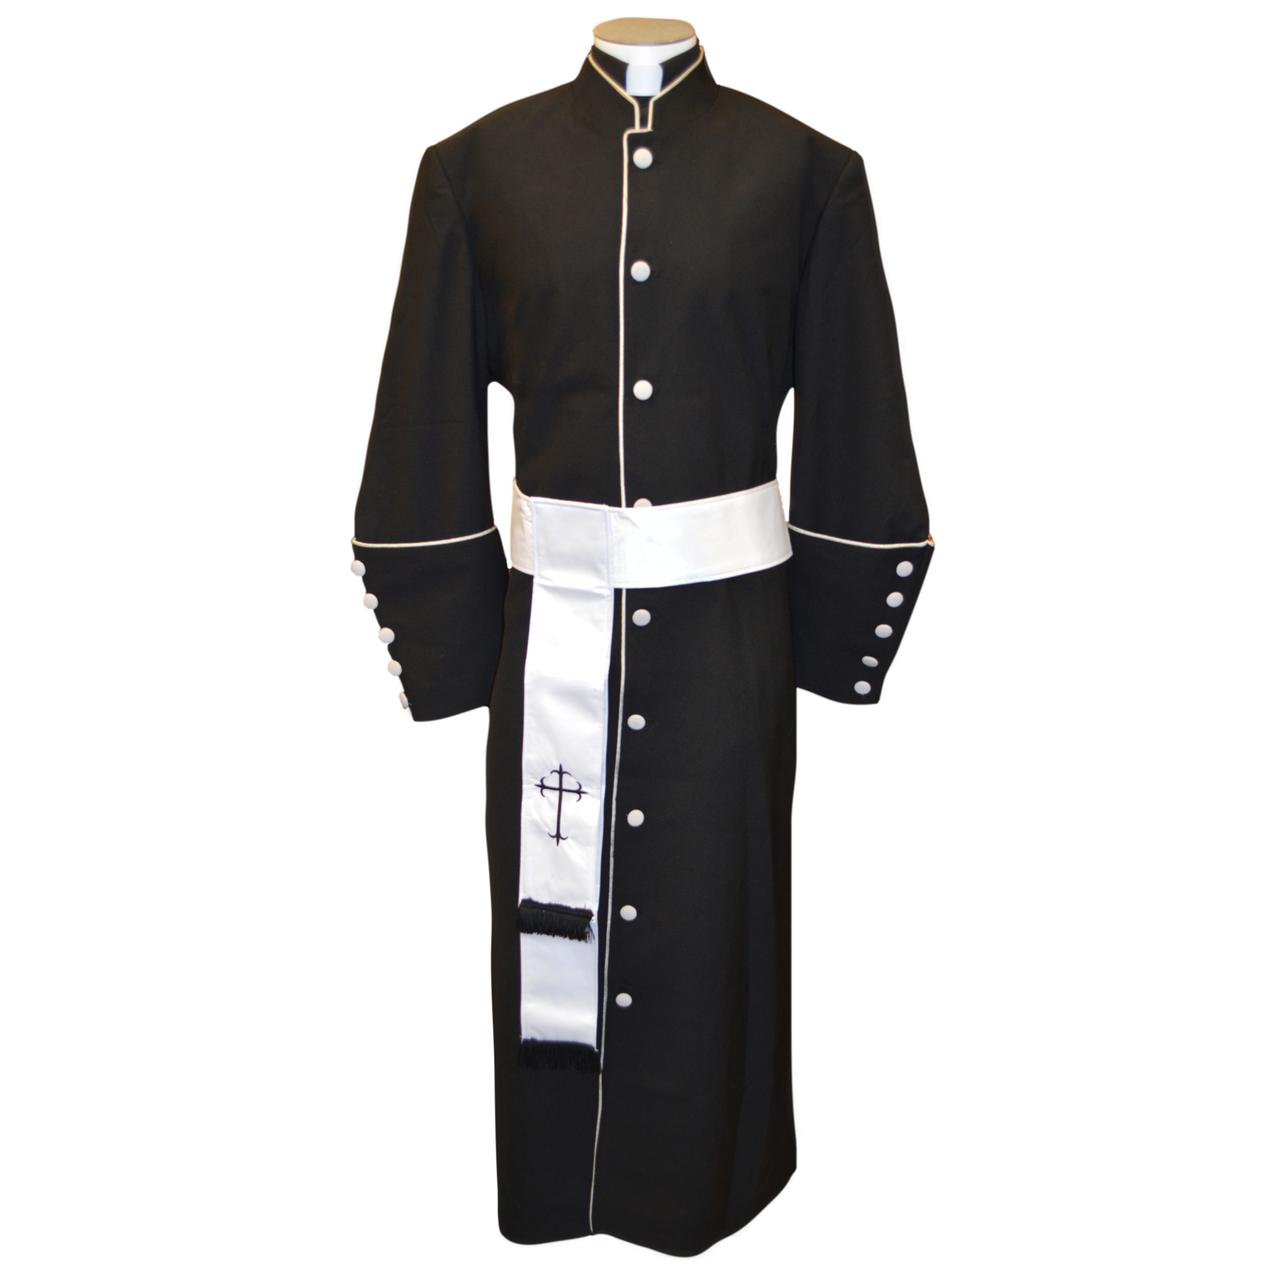 e07c7f3070 178 M. Men s Pastor Clergy Robe - Black White Cincture Set